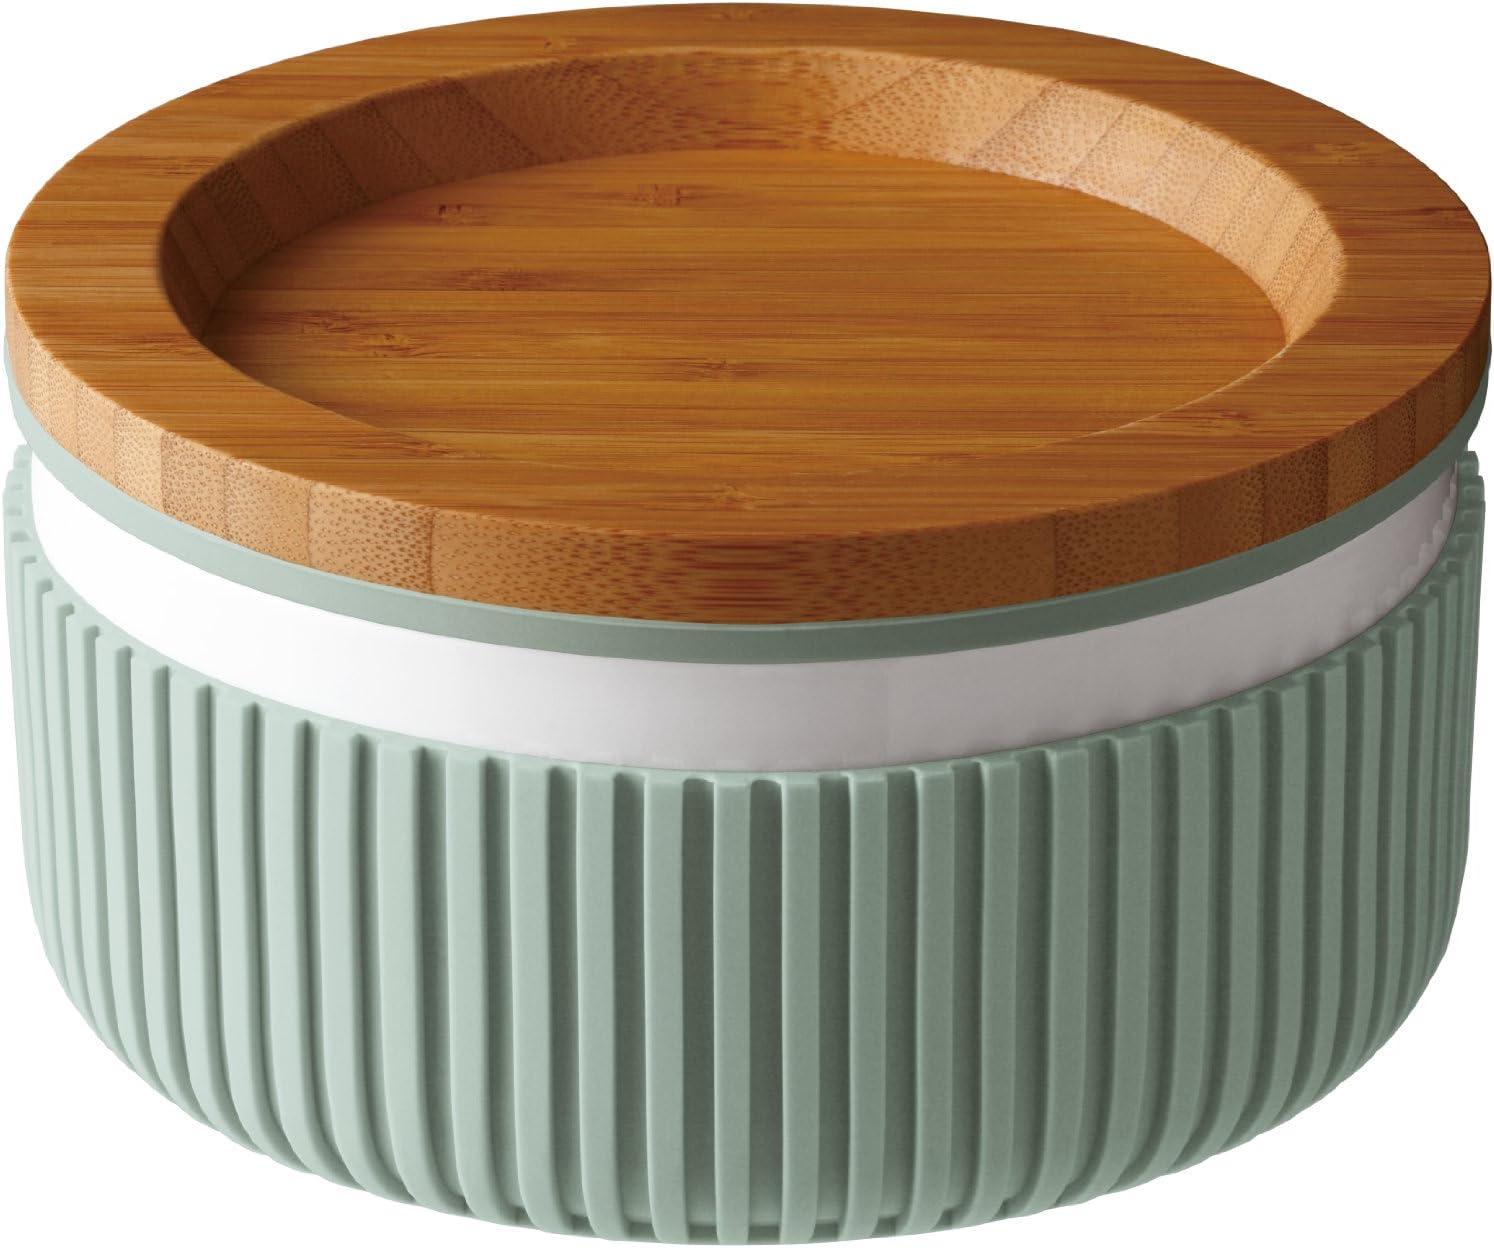 wholesale High quality new JIA Inc. Abundance - Multifunction Box Food Green Pastel